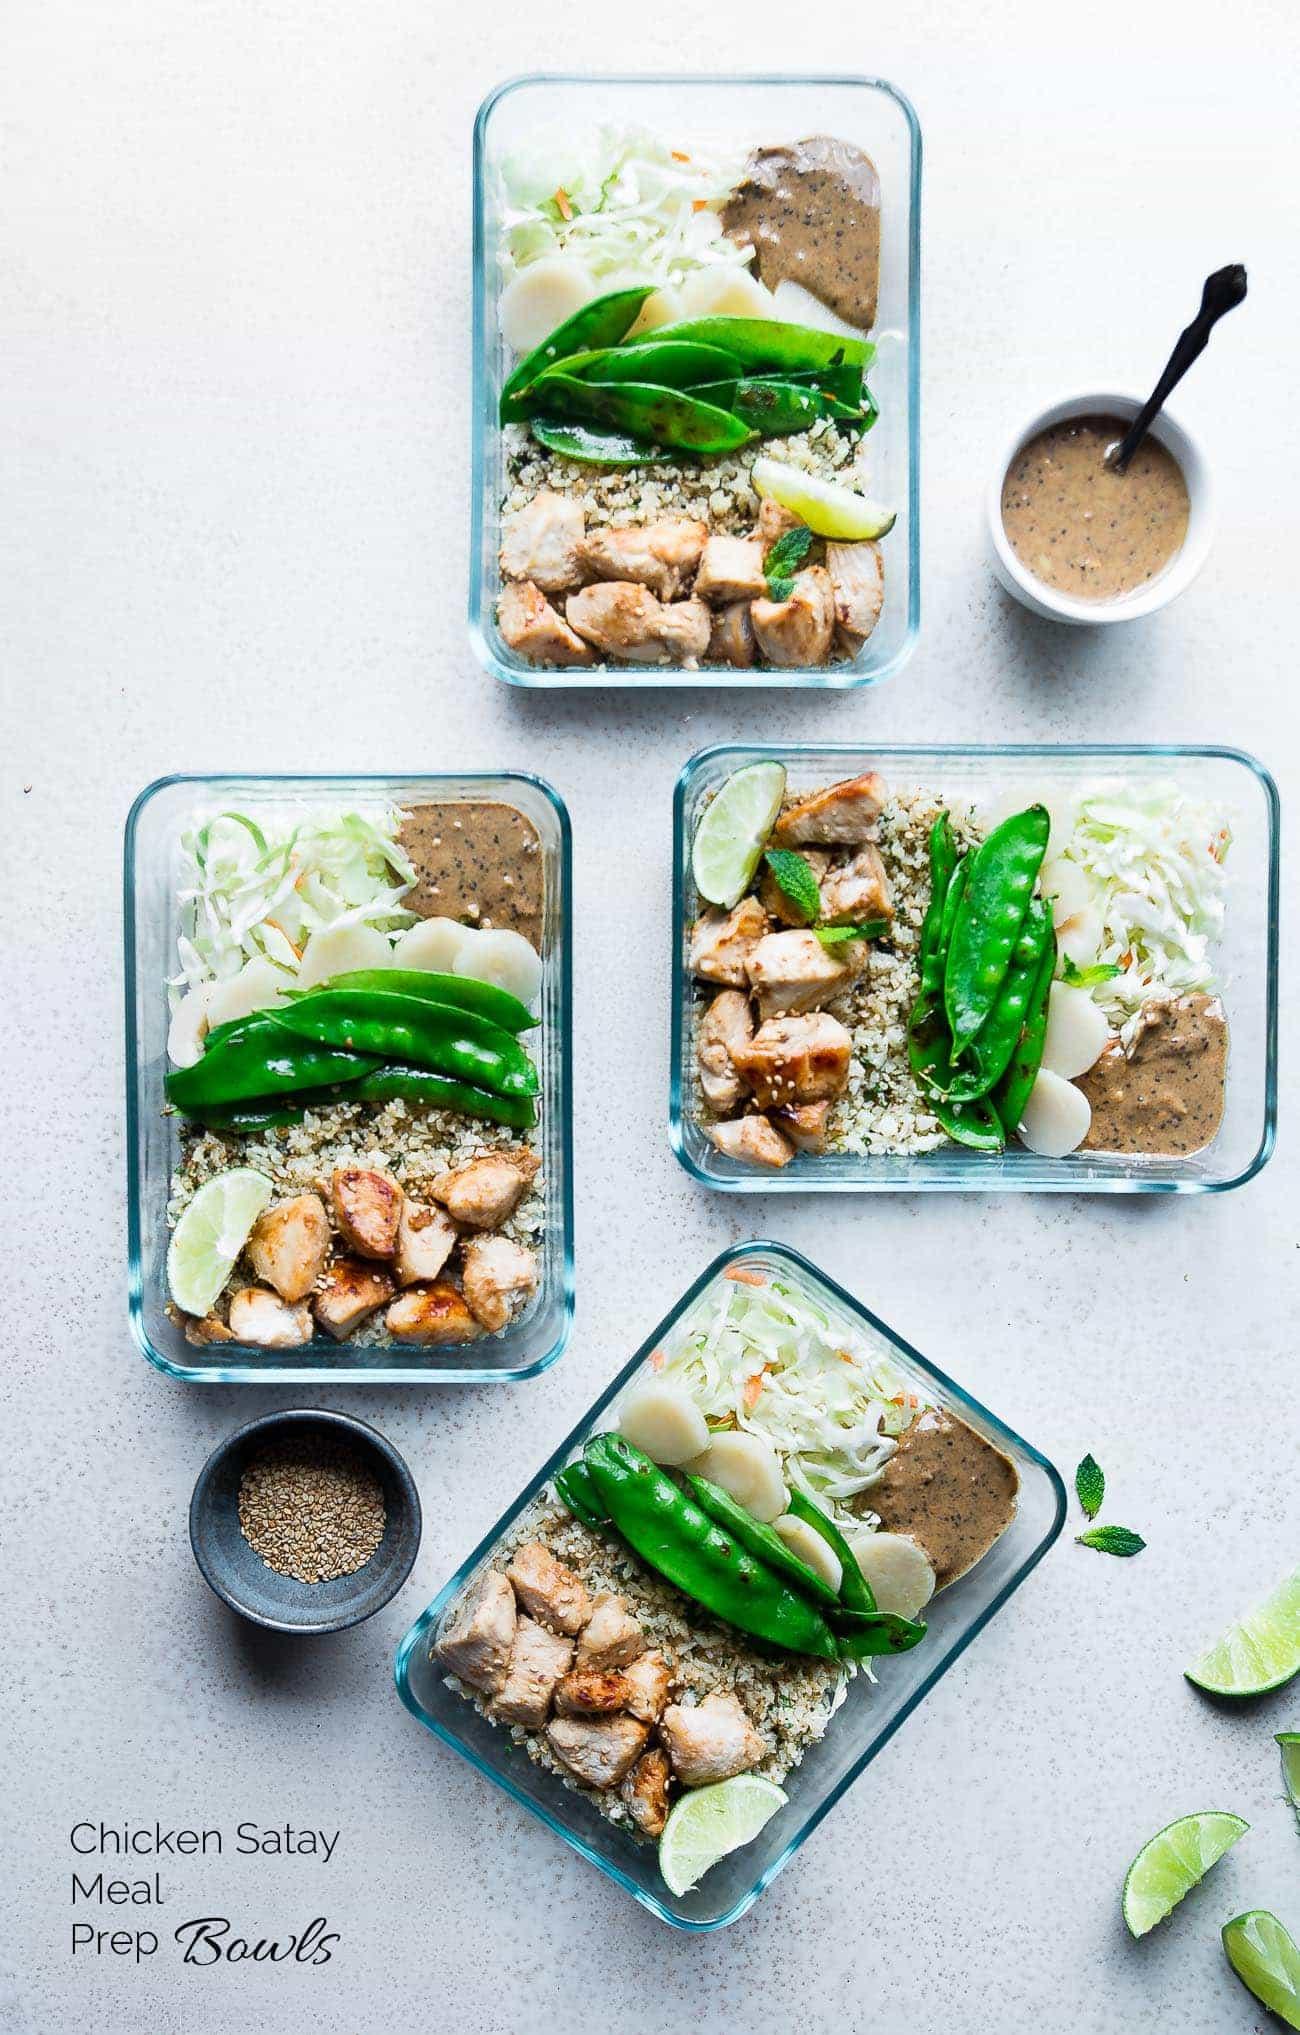 Chicken Satay Meal Prep Bowls